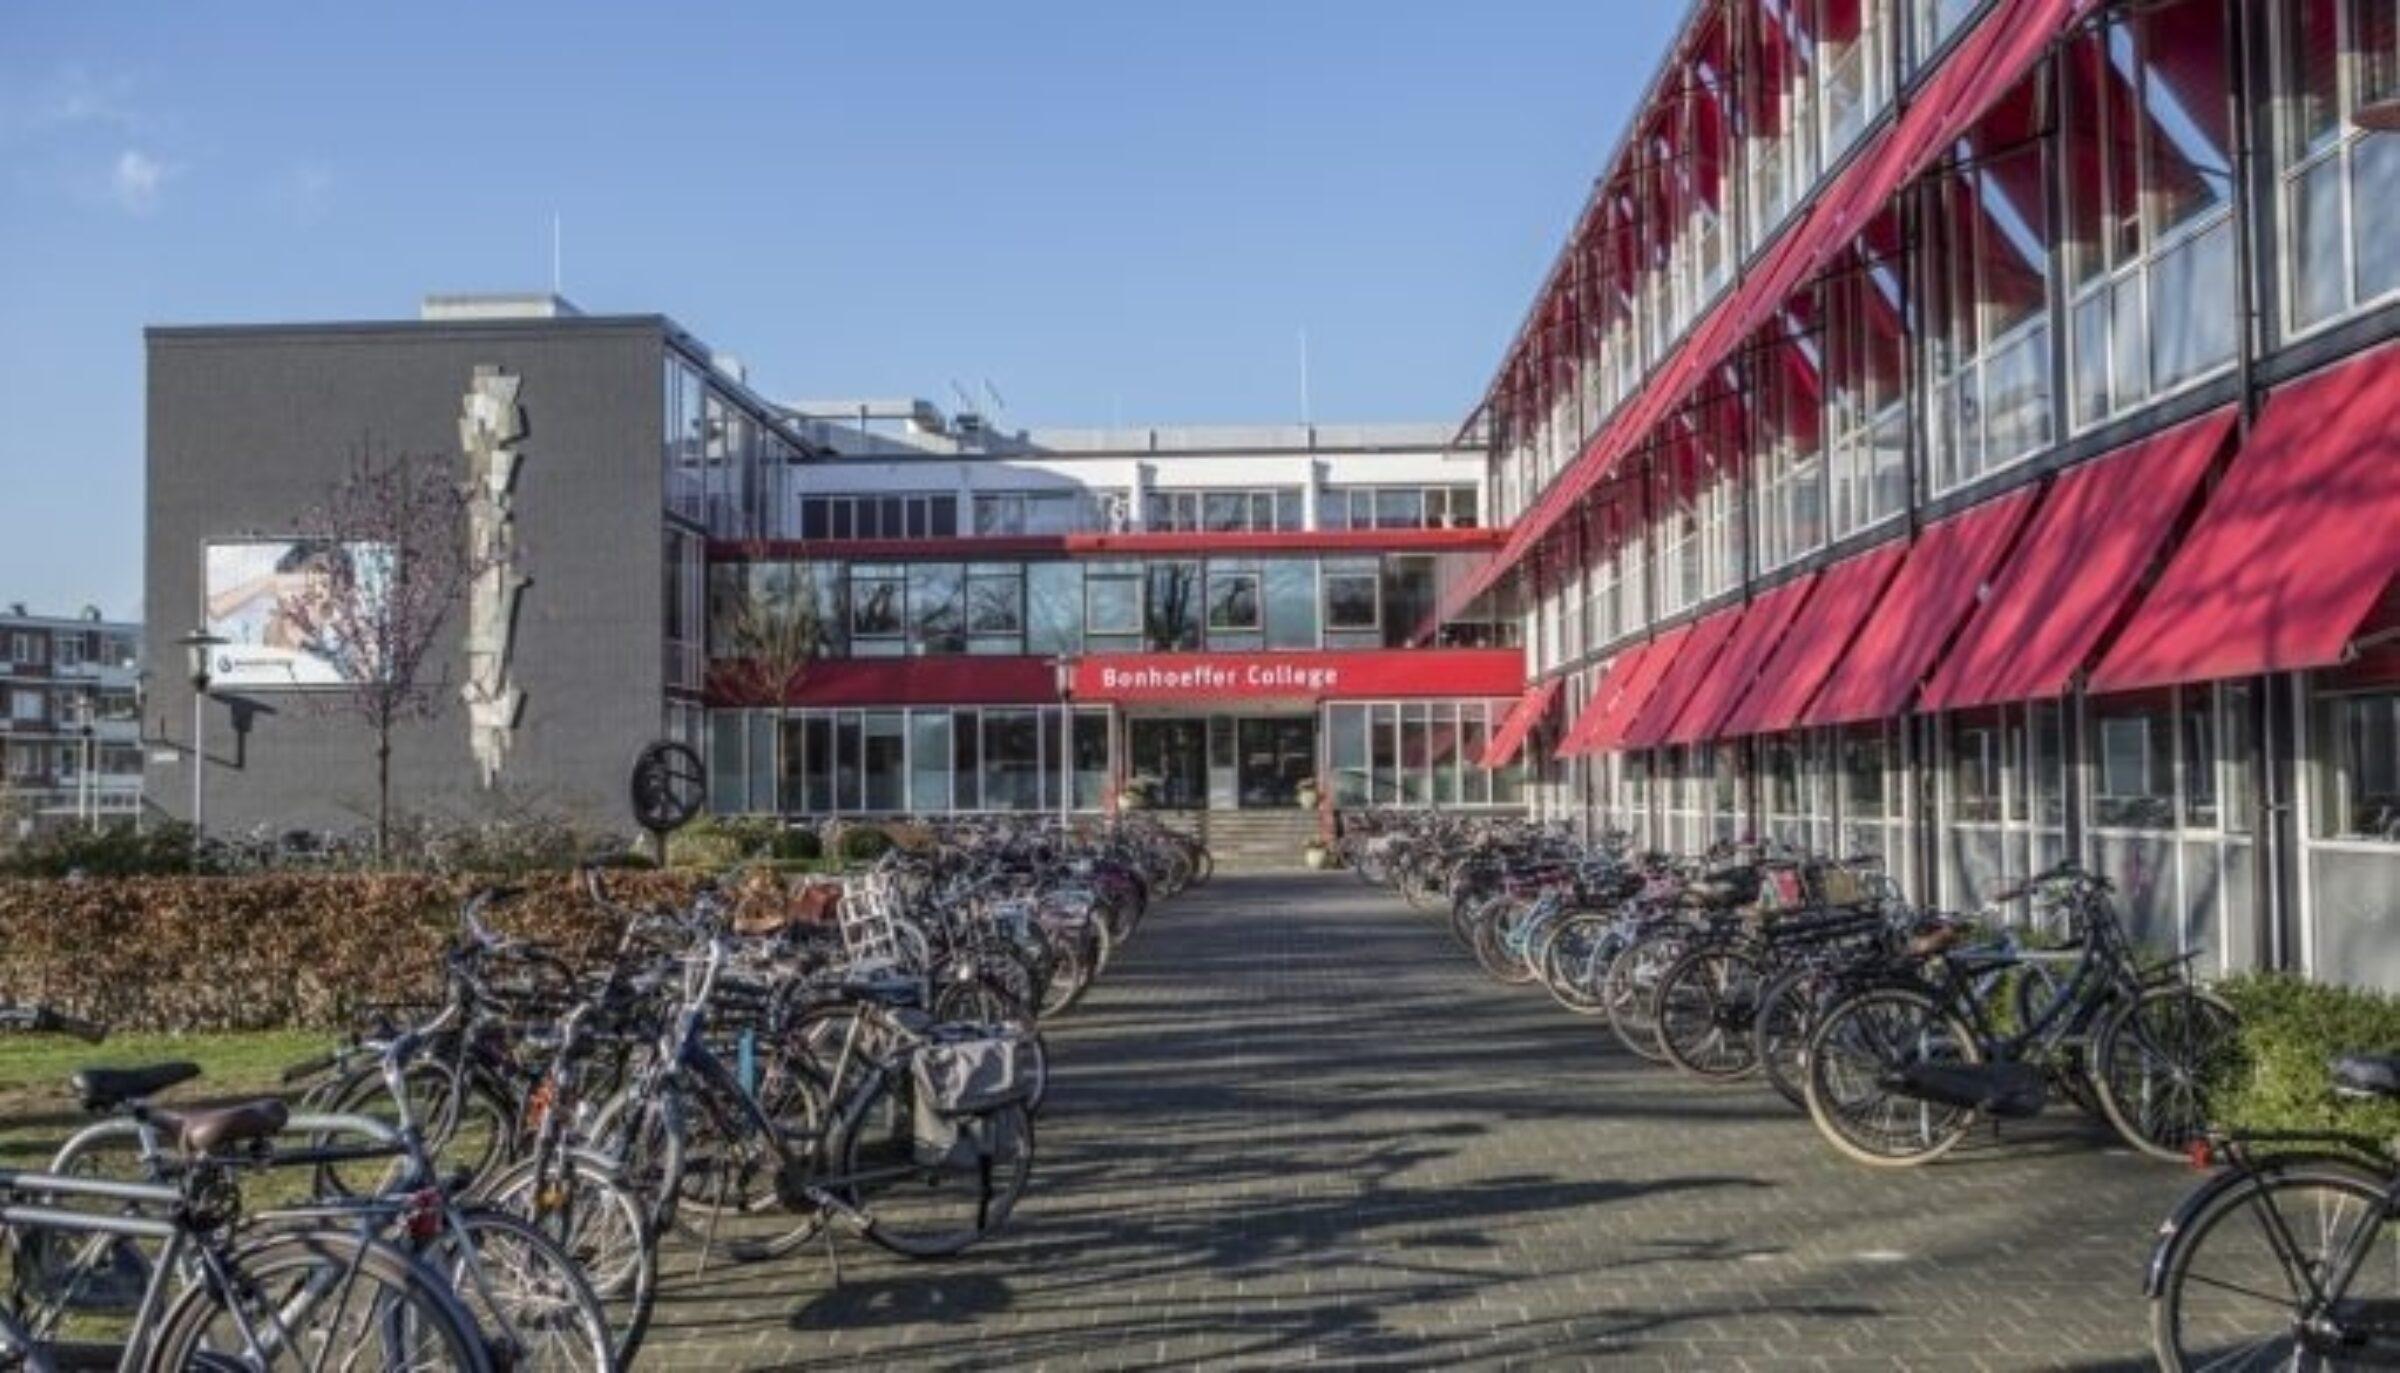 Bonhoeffer Bruggertstraat Enschede